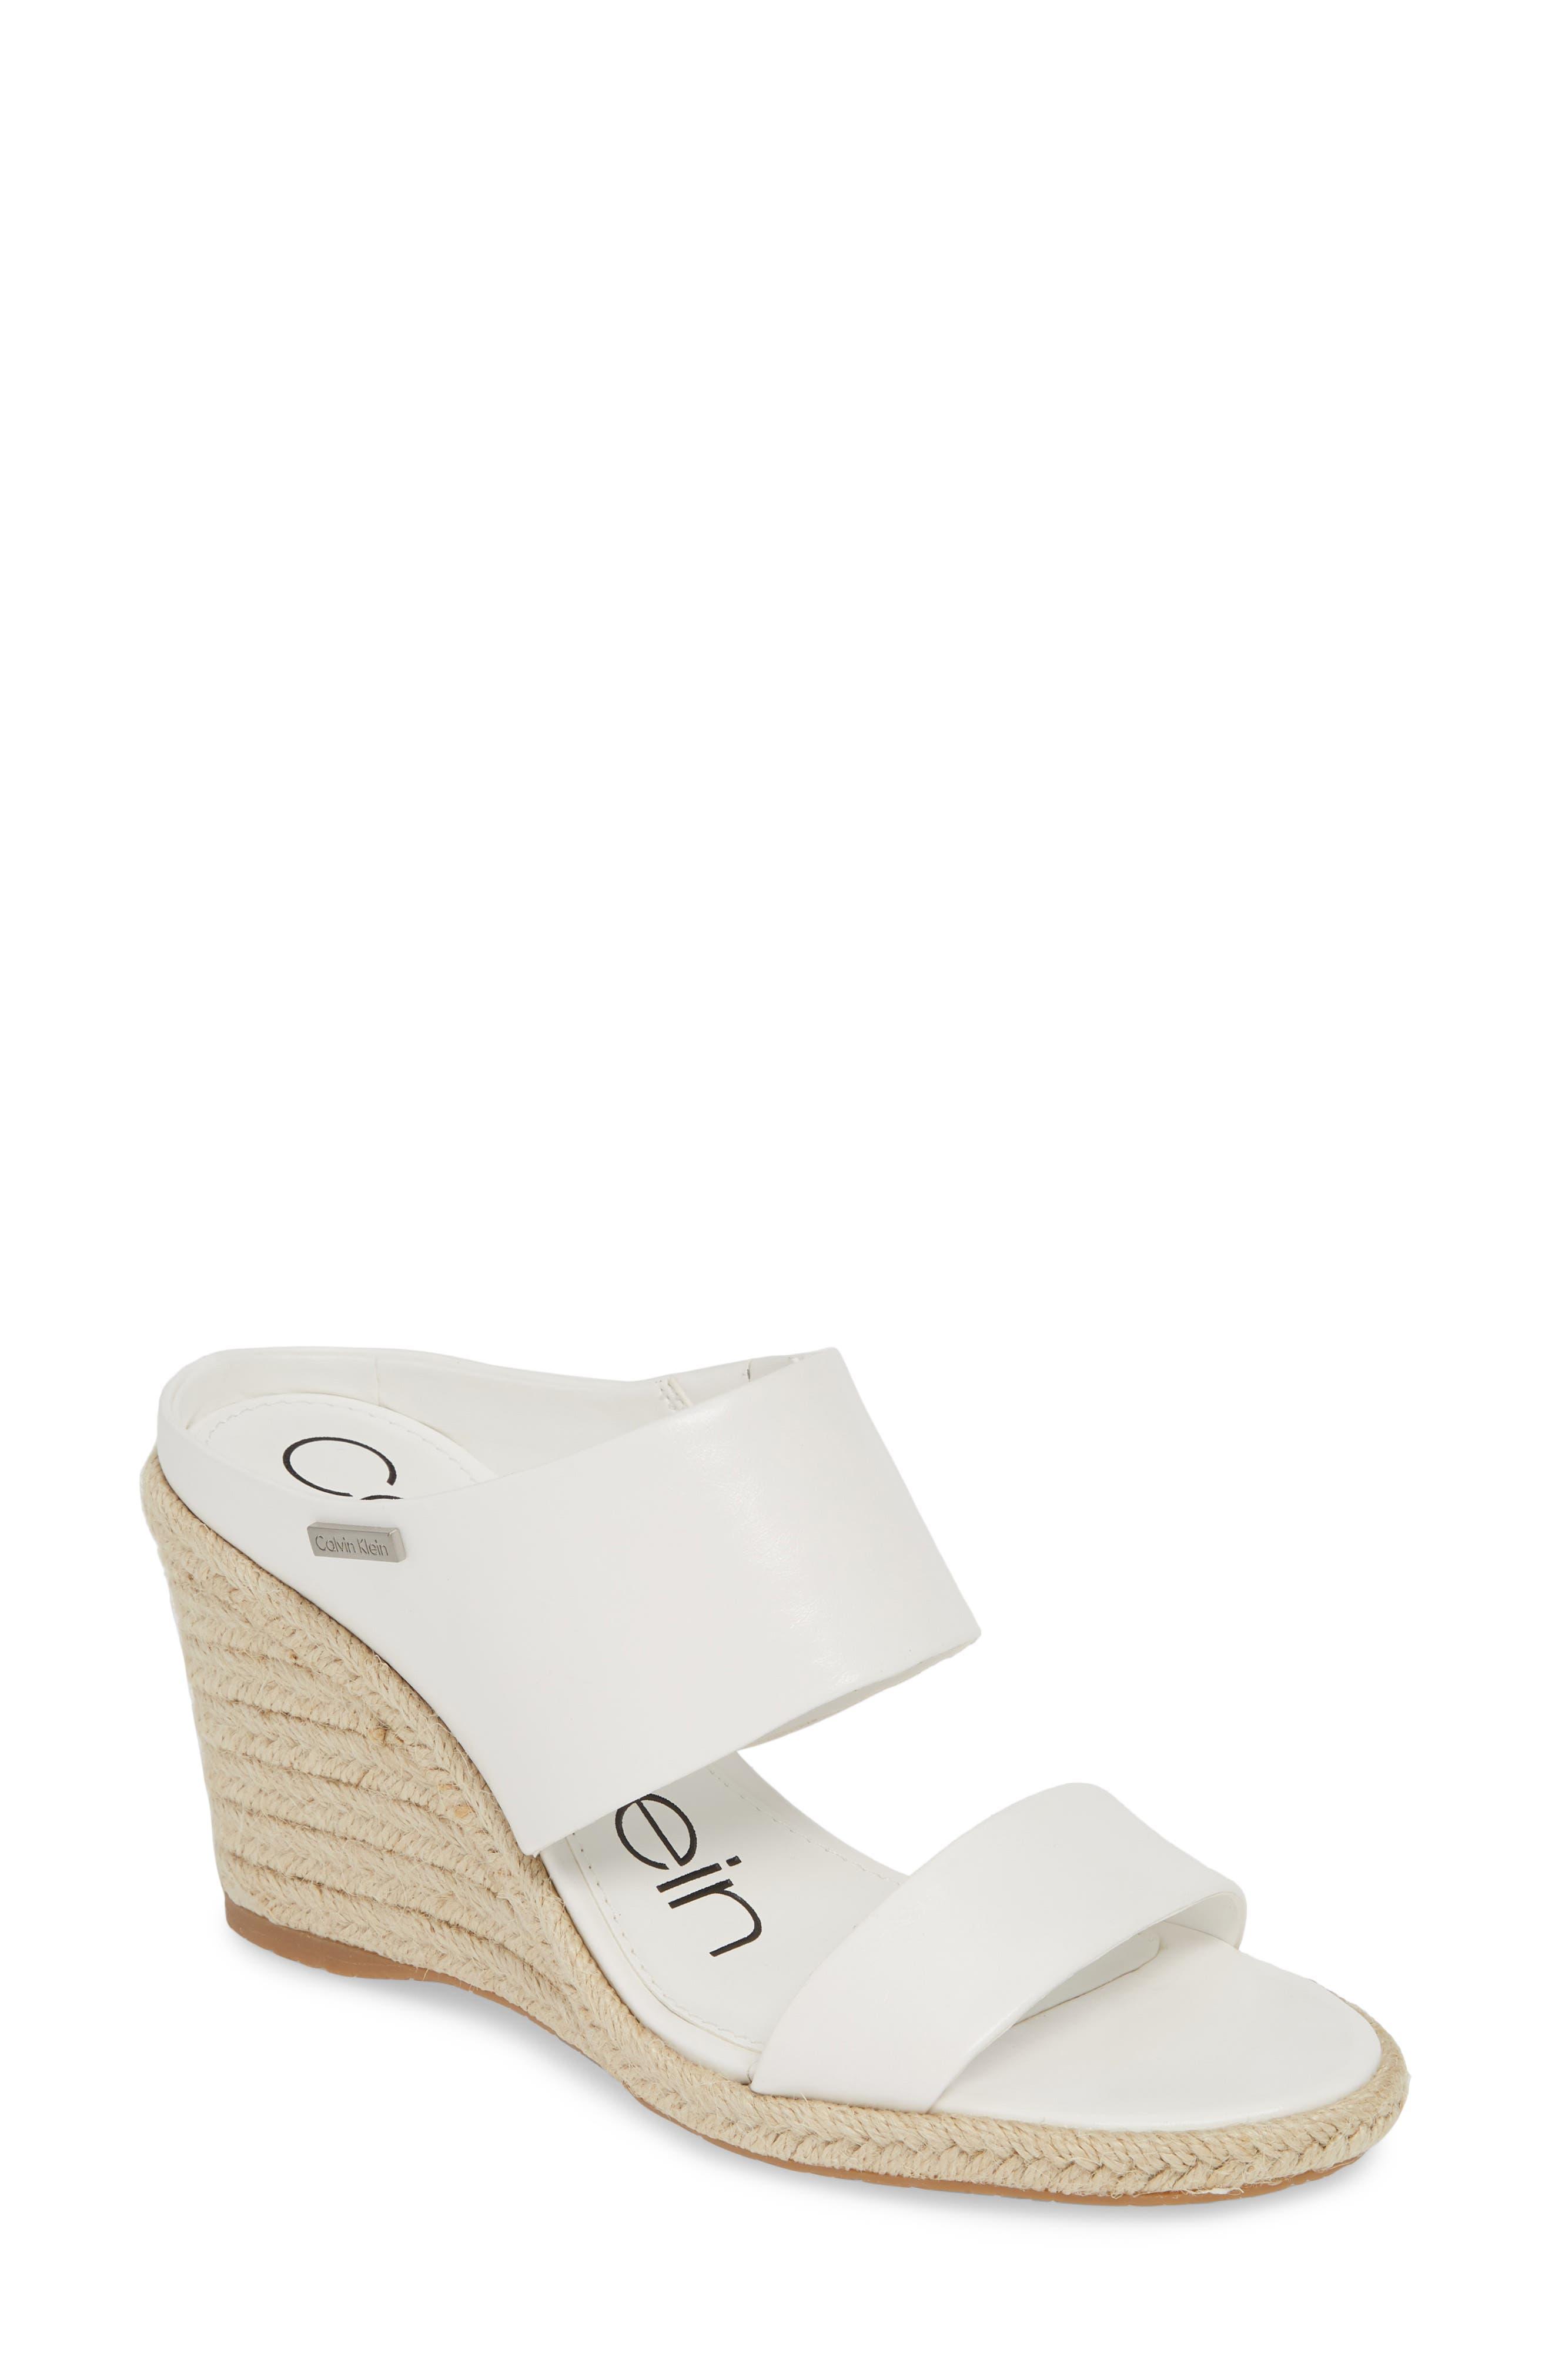 Calvin Klein Brooke Espadrille Wedge Sandal, White